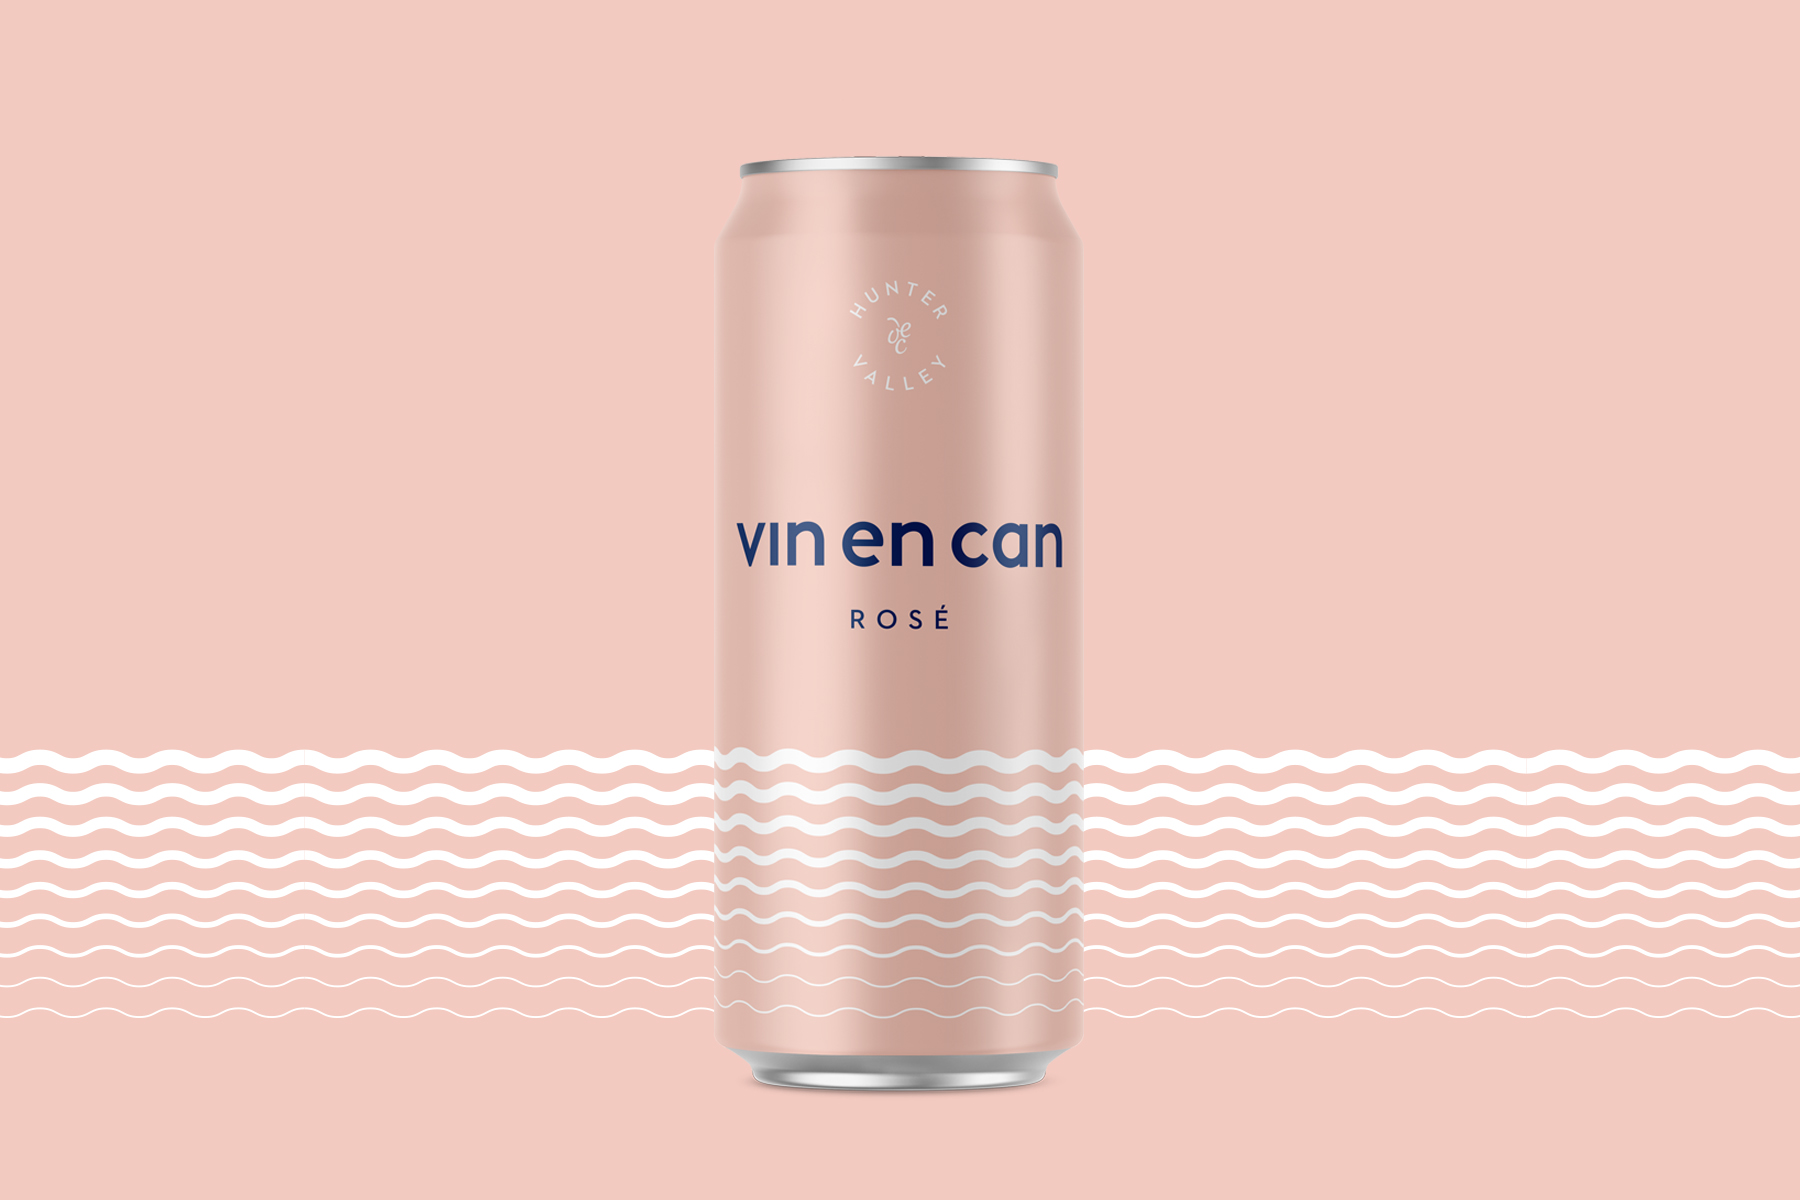 VinEnCan-web1.jpg